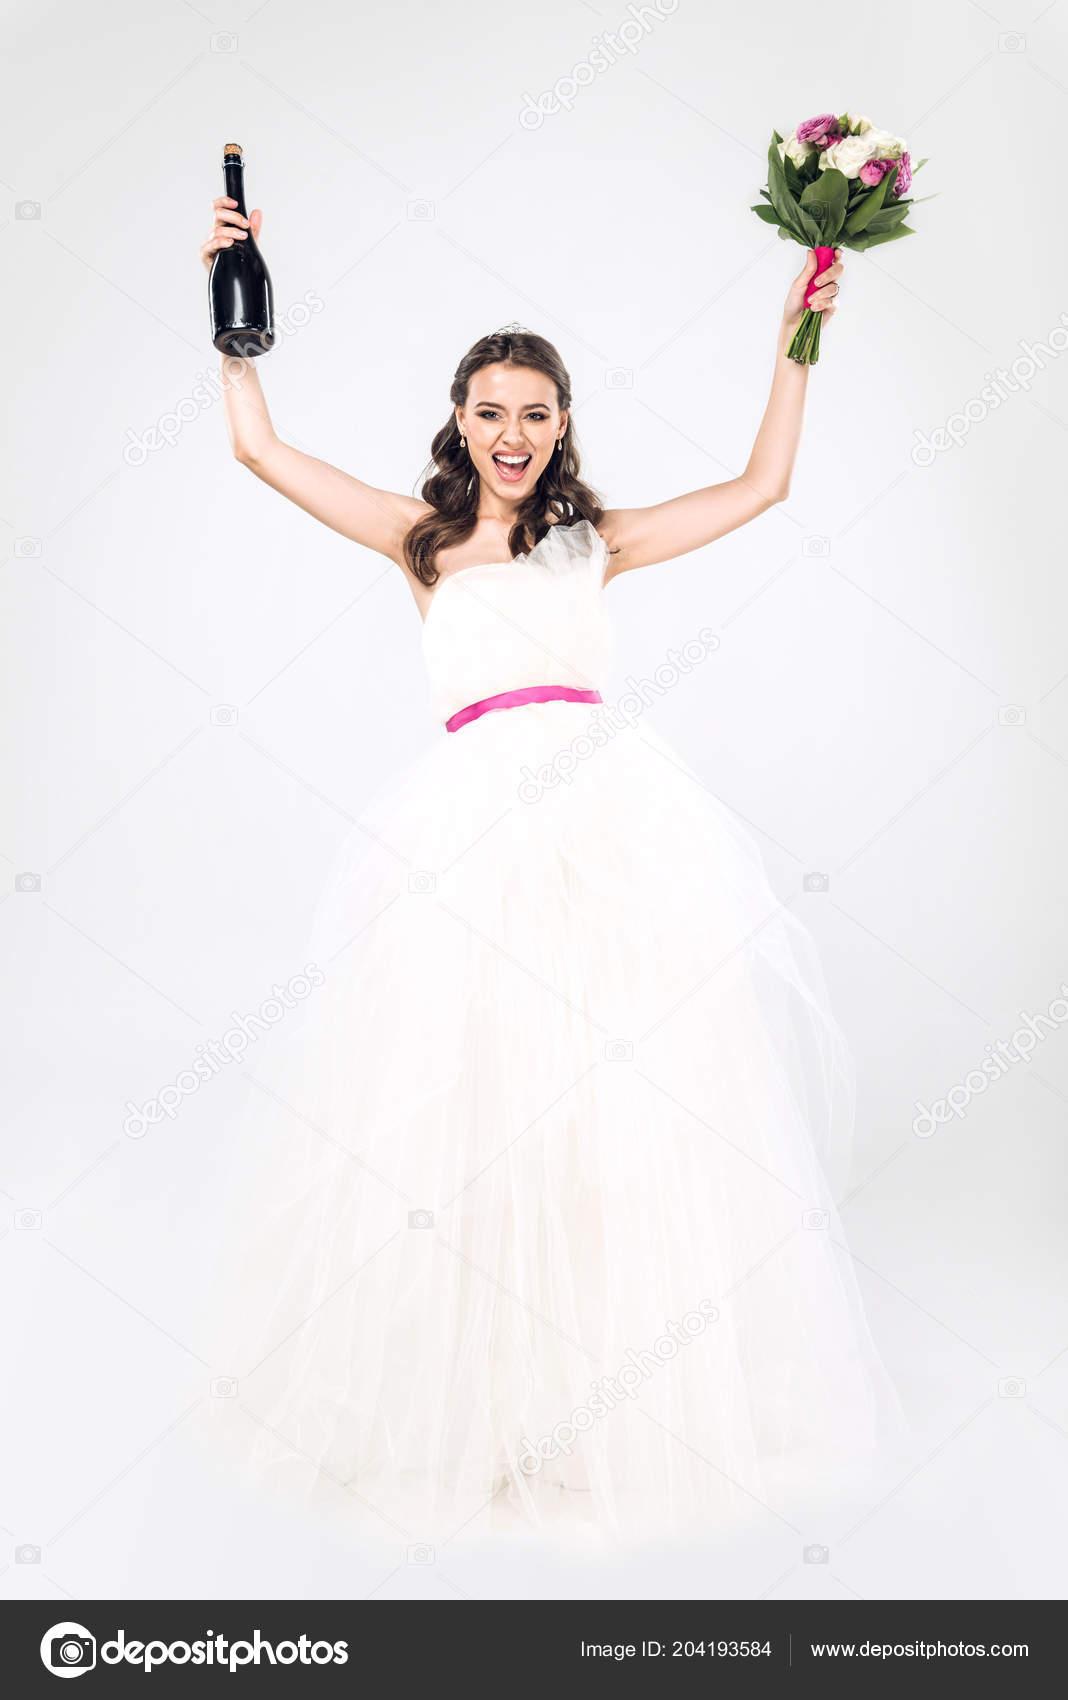 Celebrating Young Bride Wedding Dress Champagne Bottle Bridal ...